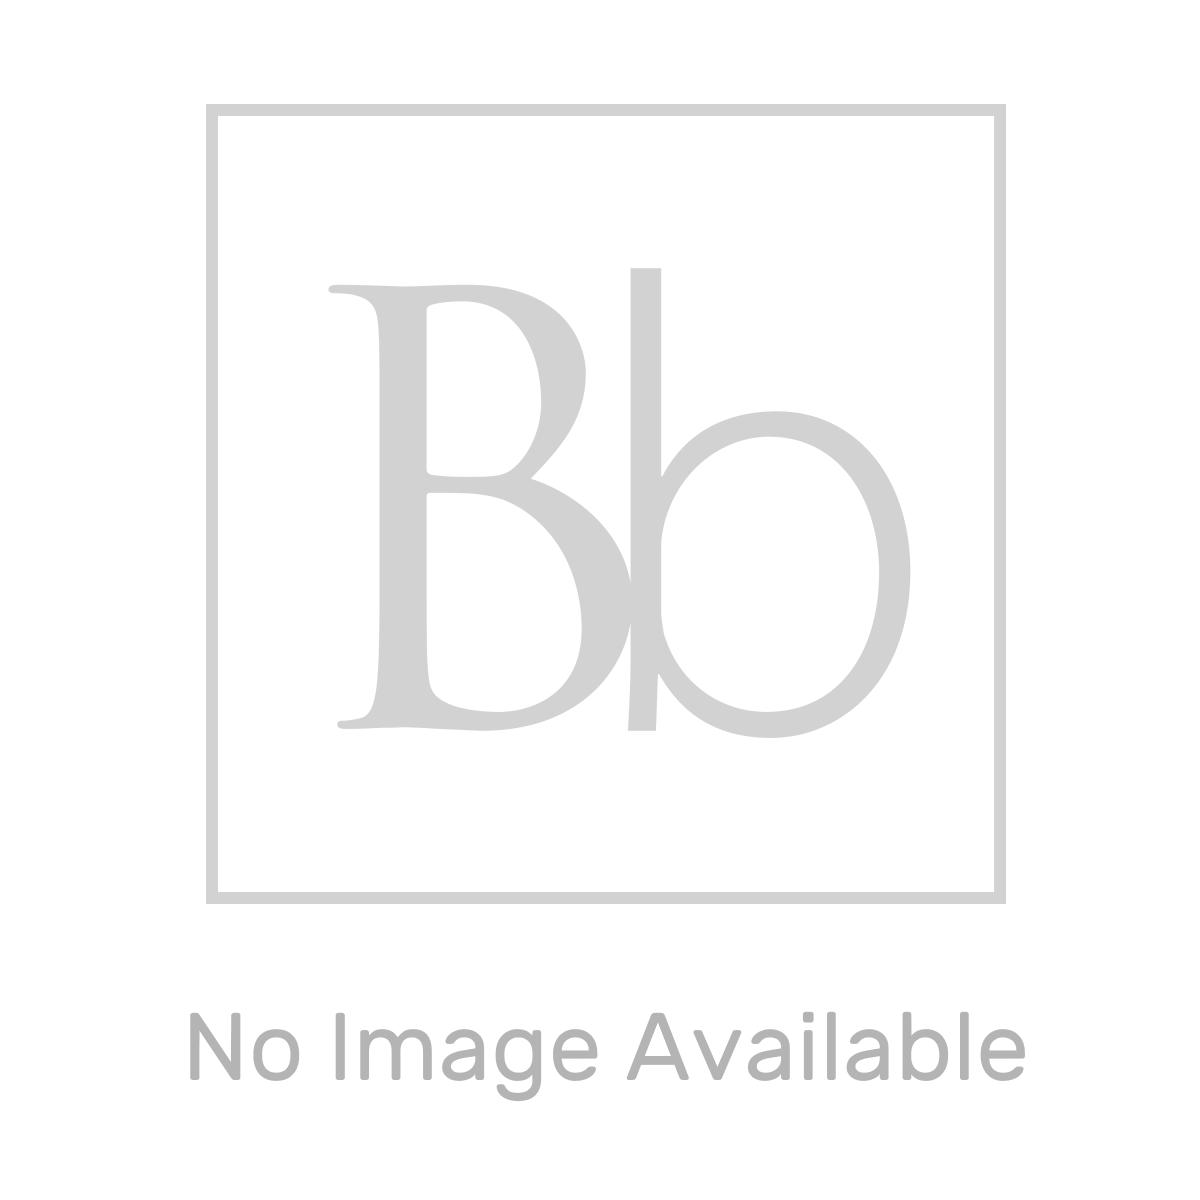 April Rectangular Anti Slip Shower Tray 900 x 760 Line Drawing